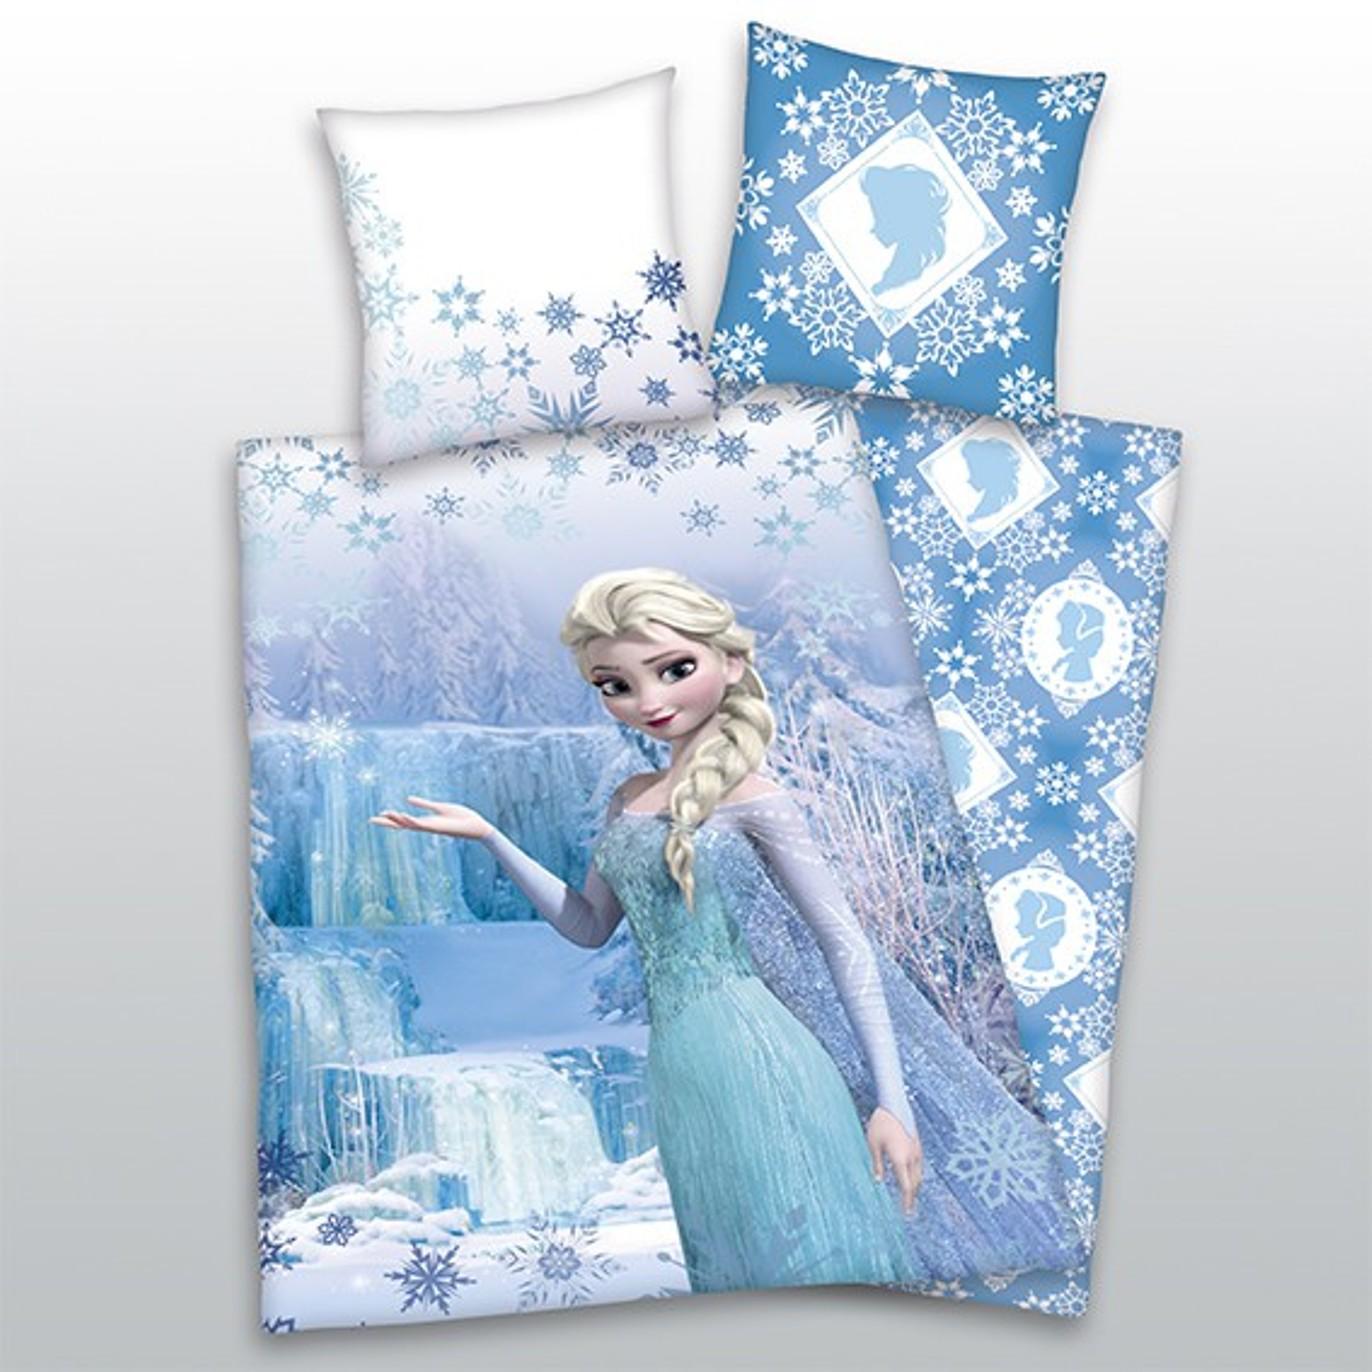 Frozen Elsa Bettwäsche Kissen 65x65cm Bettbezug 140x200cm Ceres